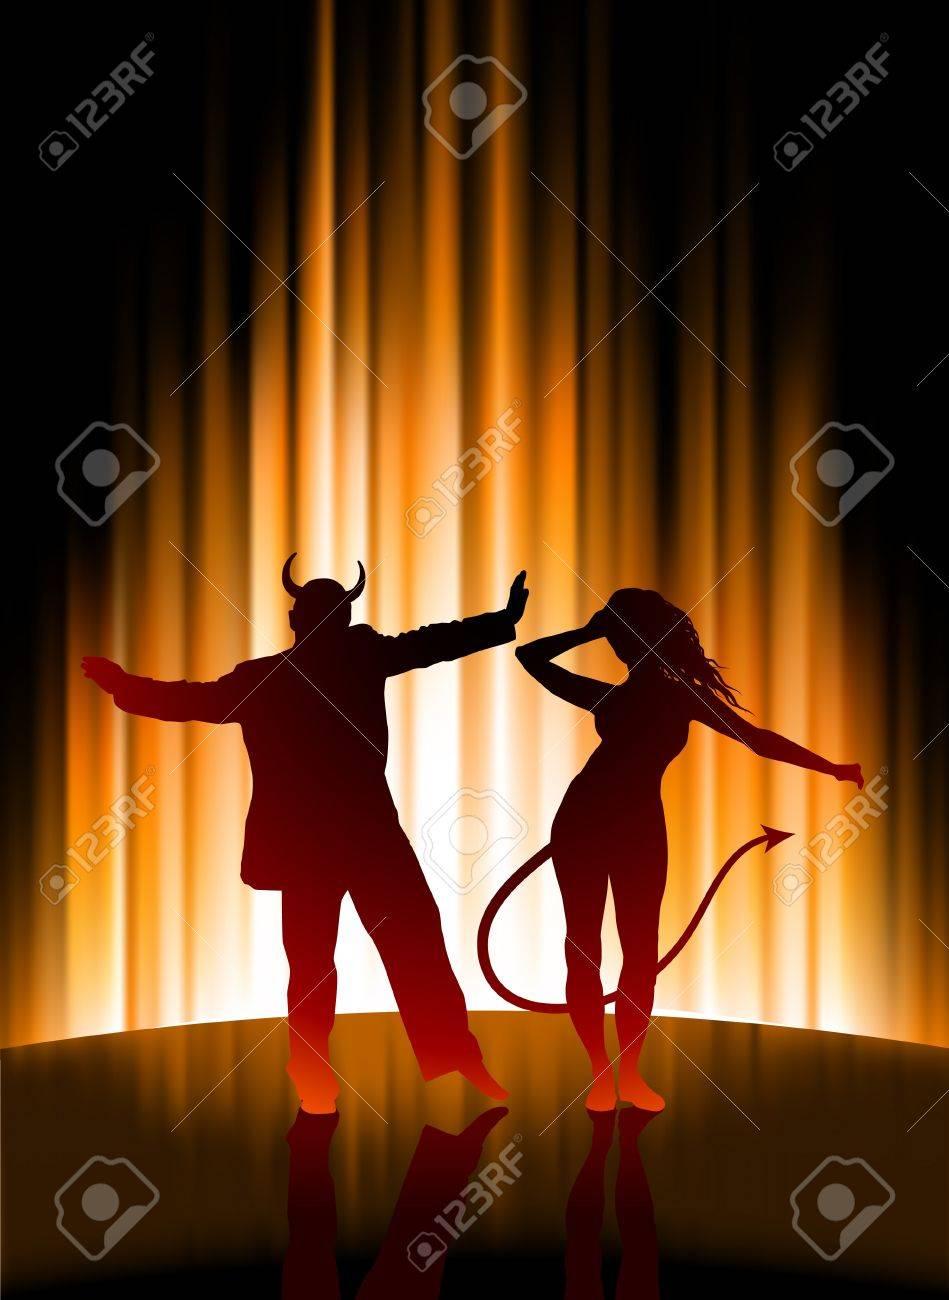 Hell Party on Abstract Spectrum BackgroundOriginal Illustration Stock Photo - 7569252